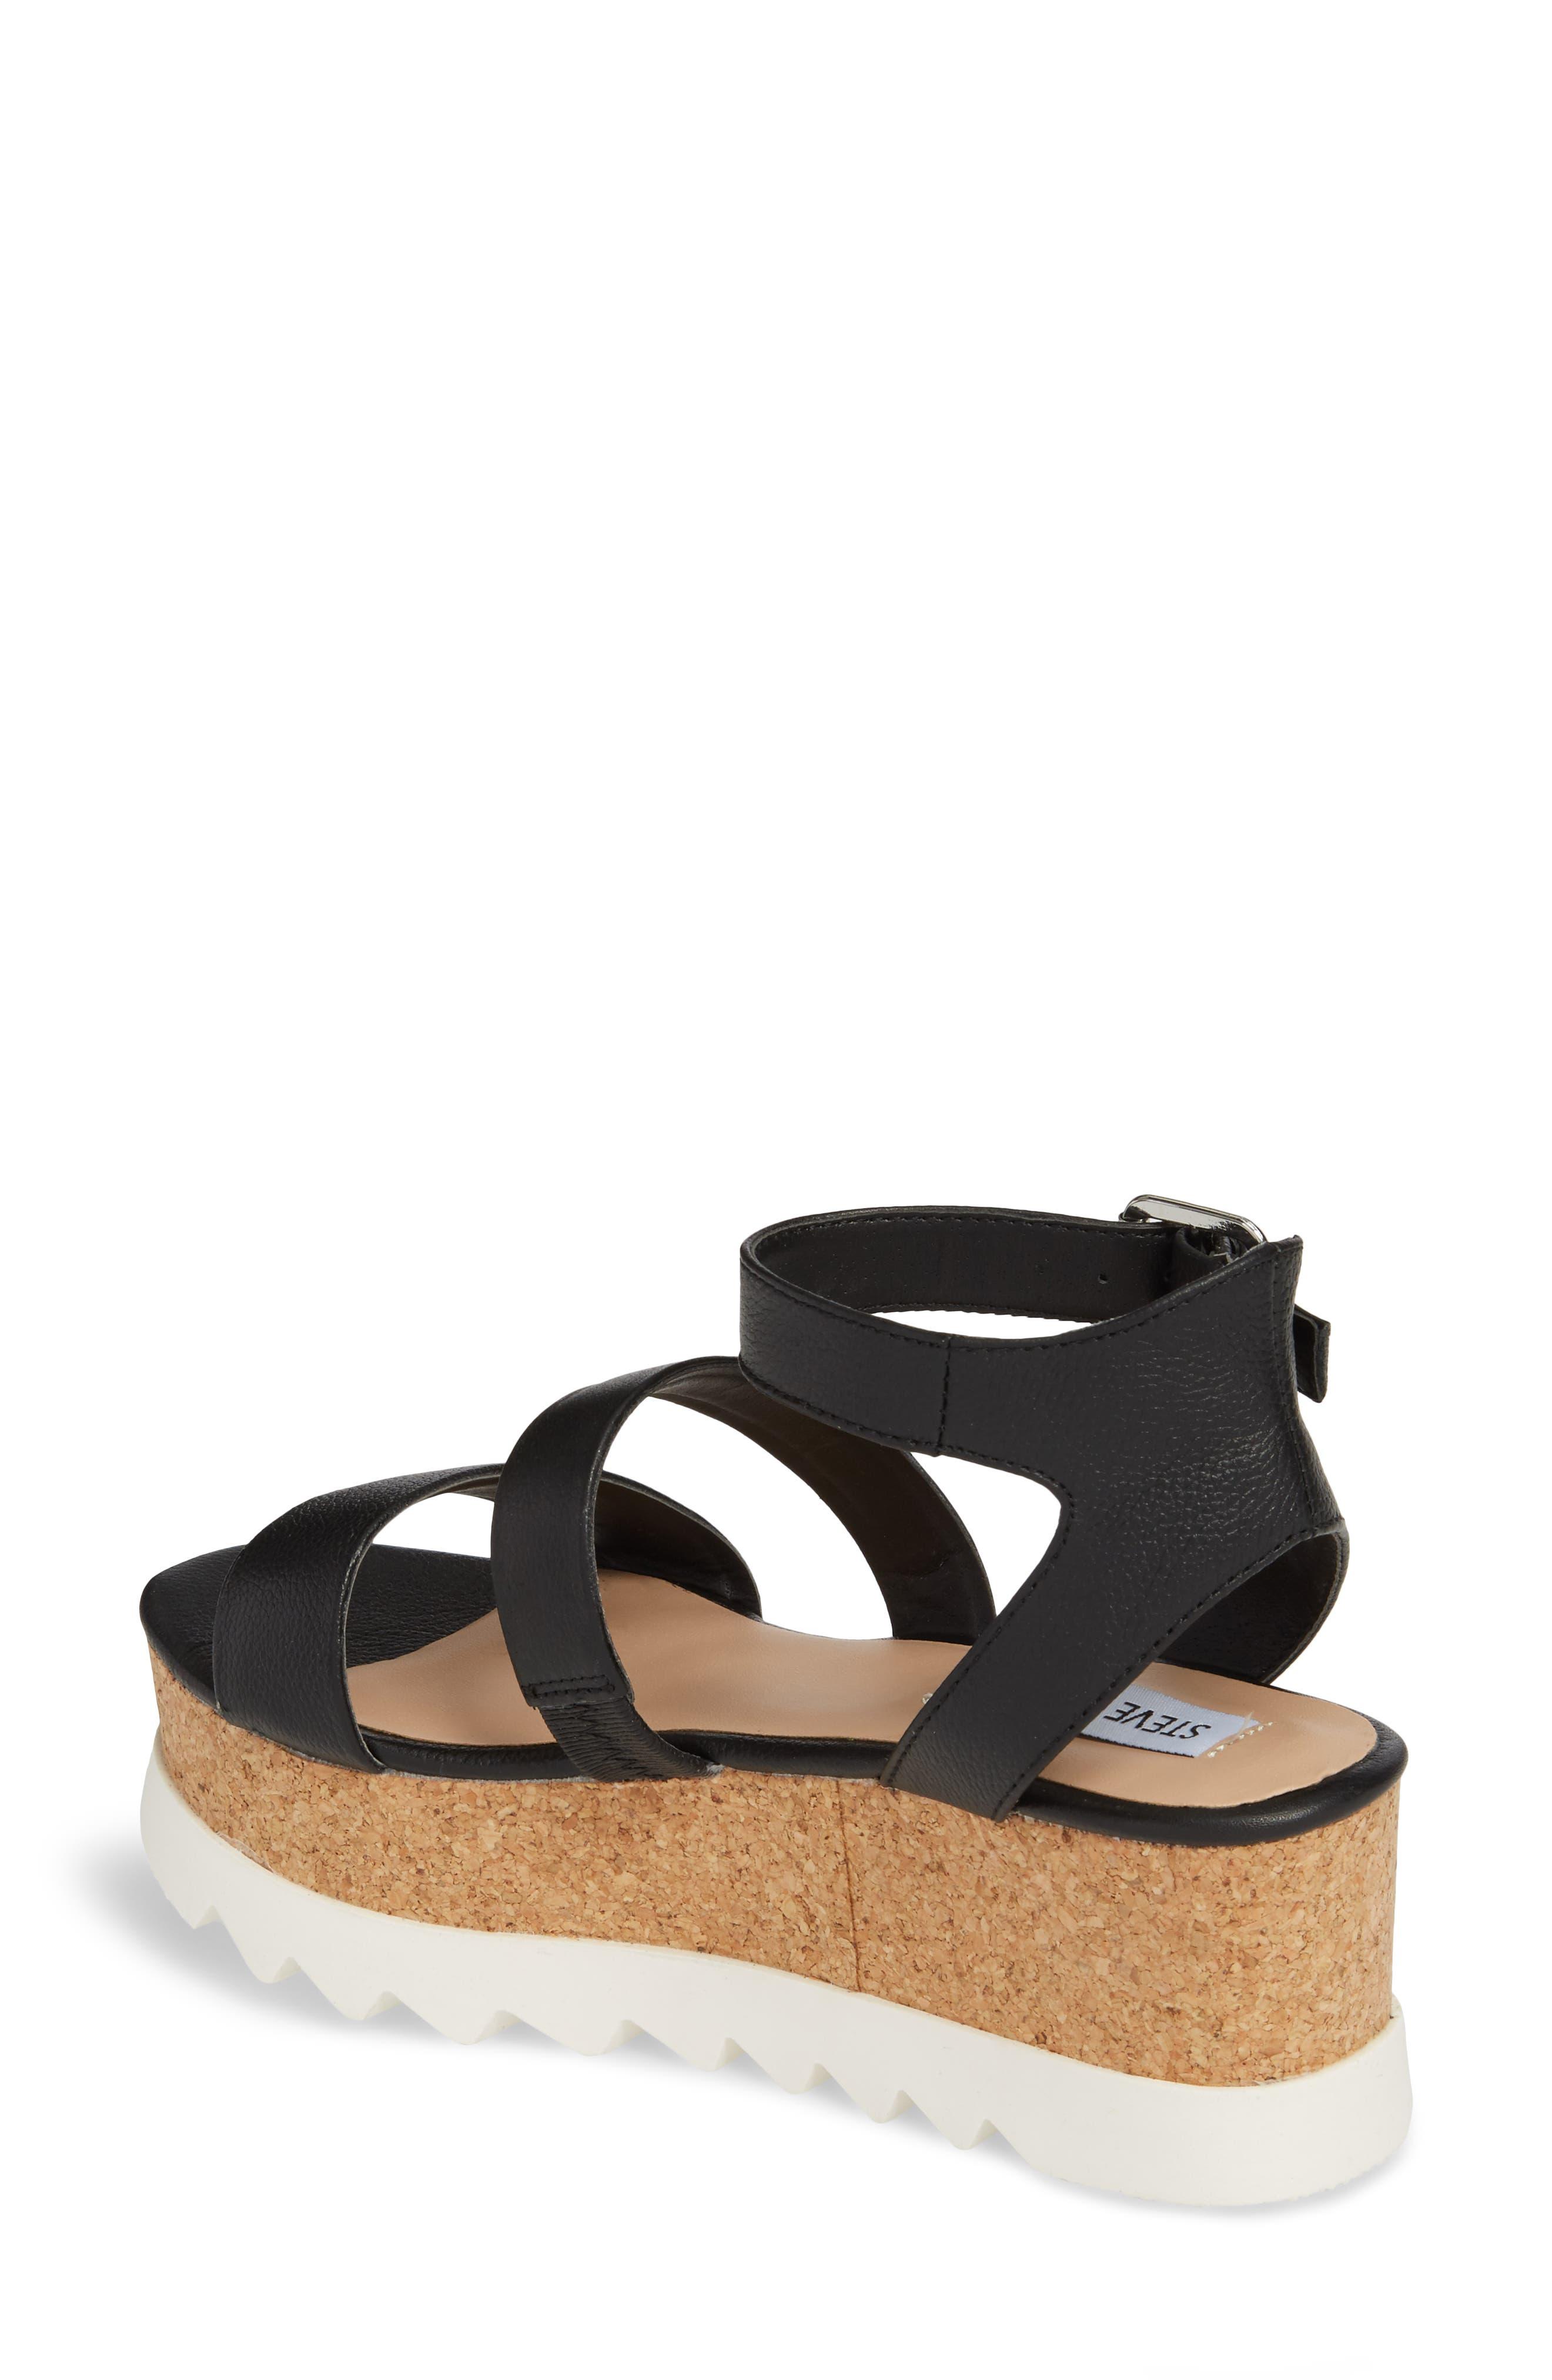 Kirsten Layered Platform Sandal,                             Alternate thumbnail 2, color,                             001